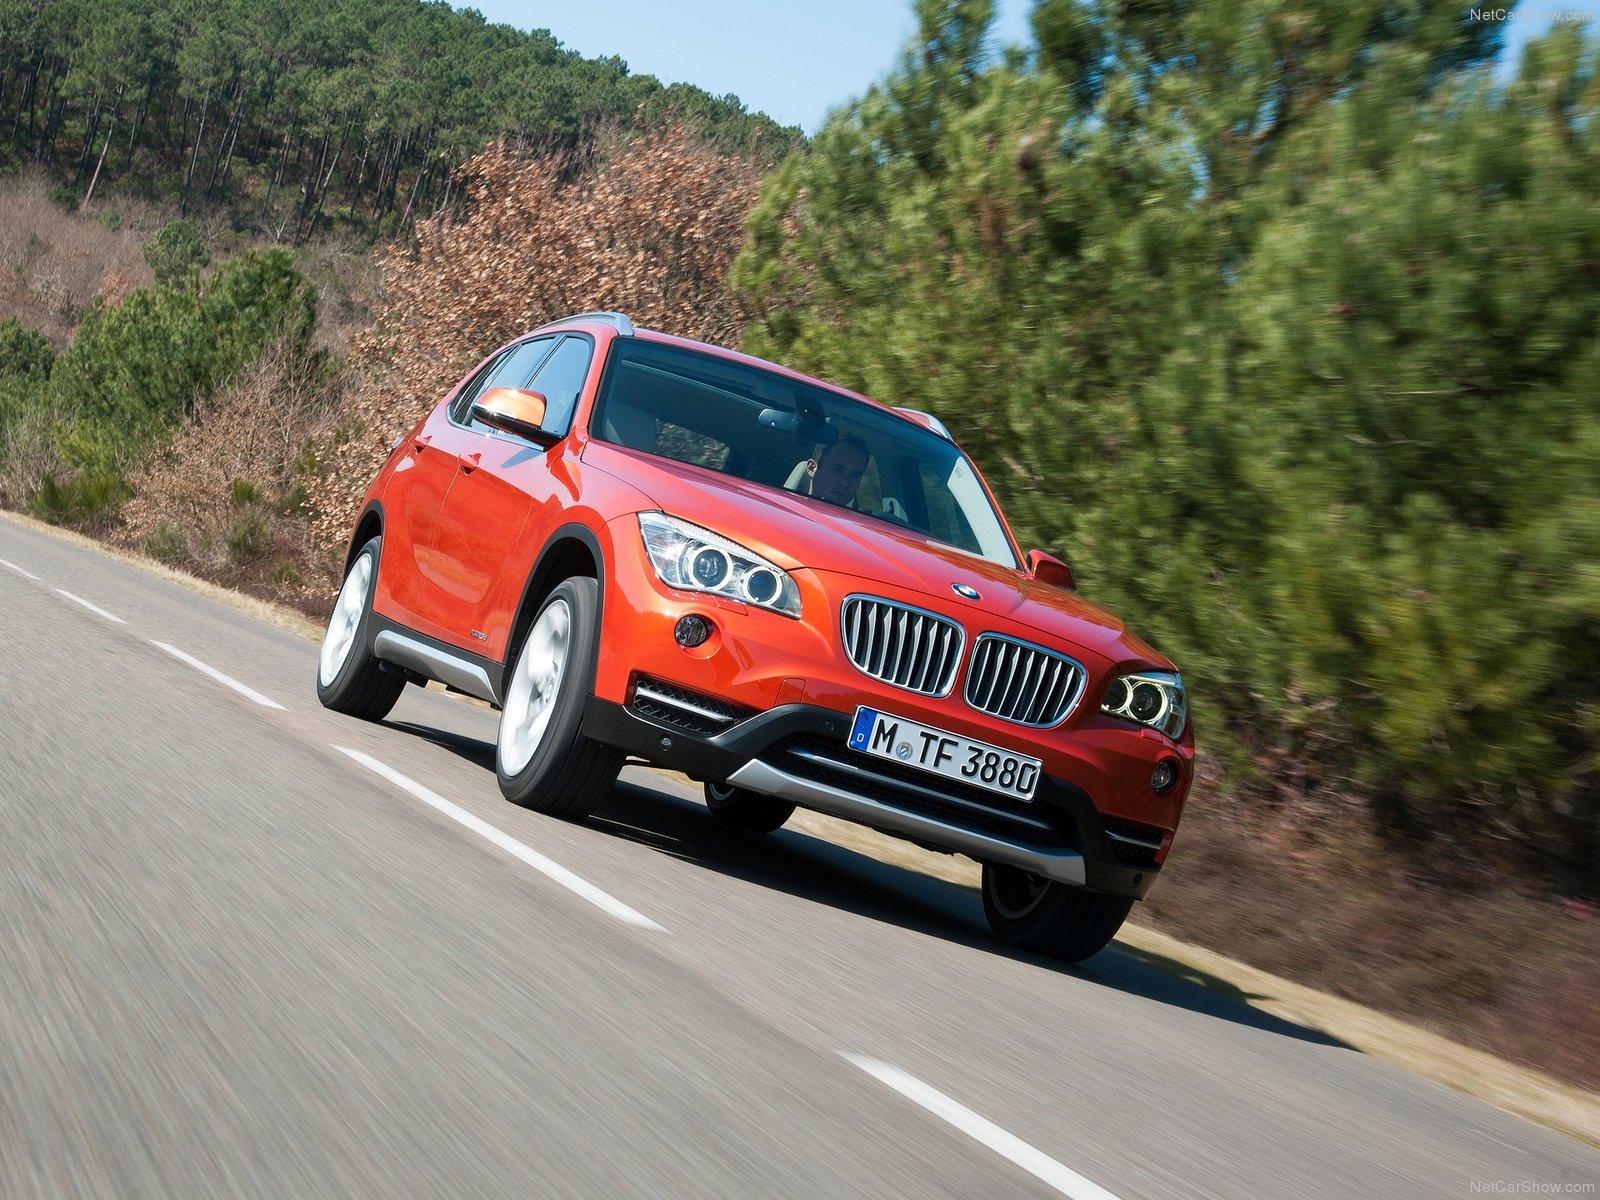 BMW-X1_2013_1600x1200_wallpaper_07.jpg